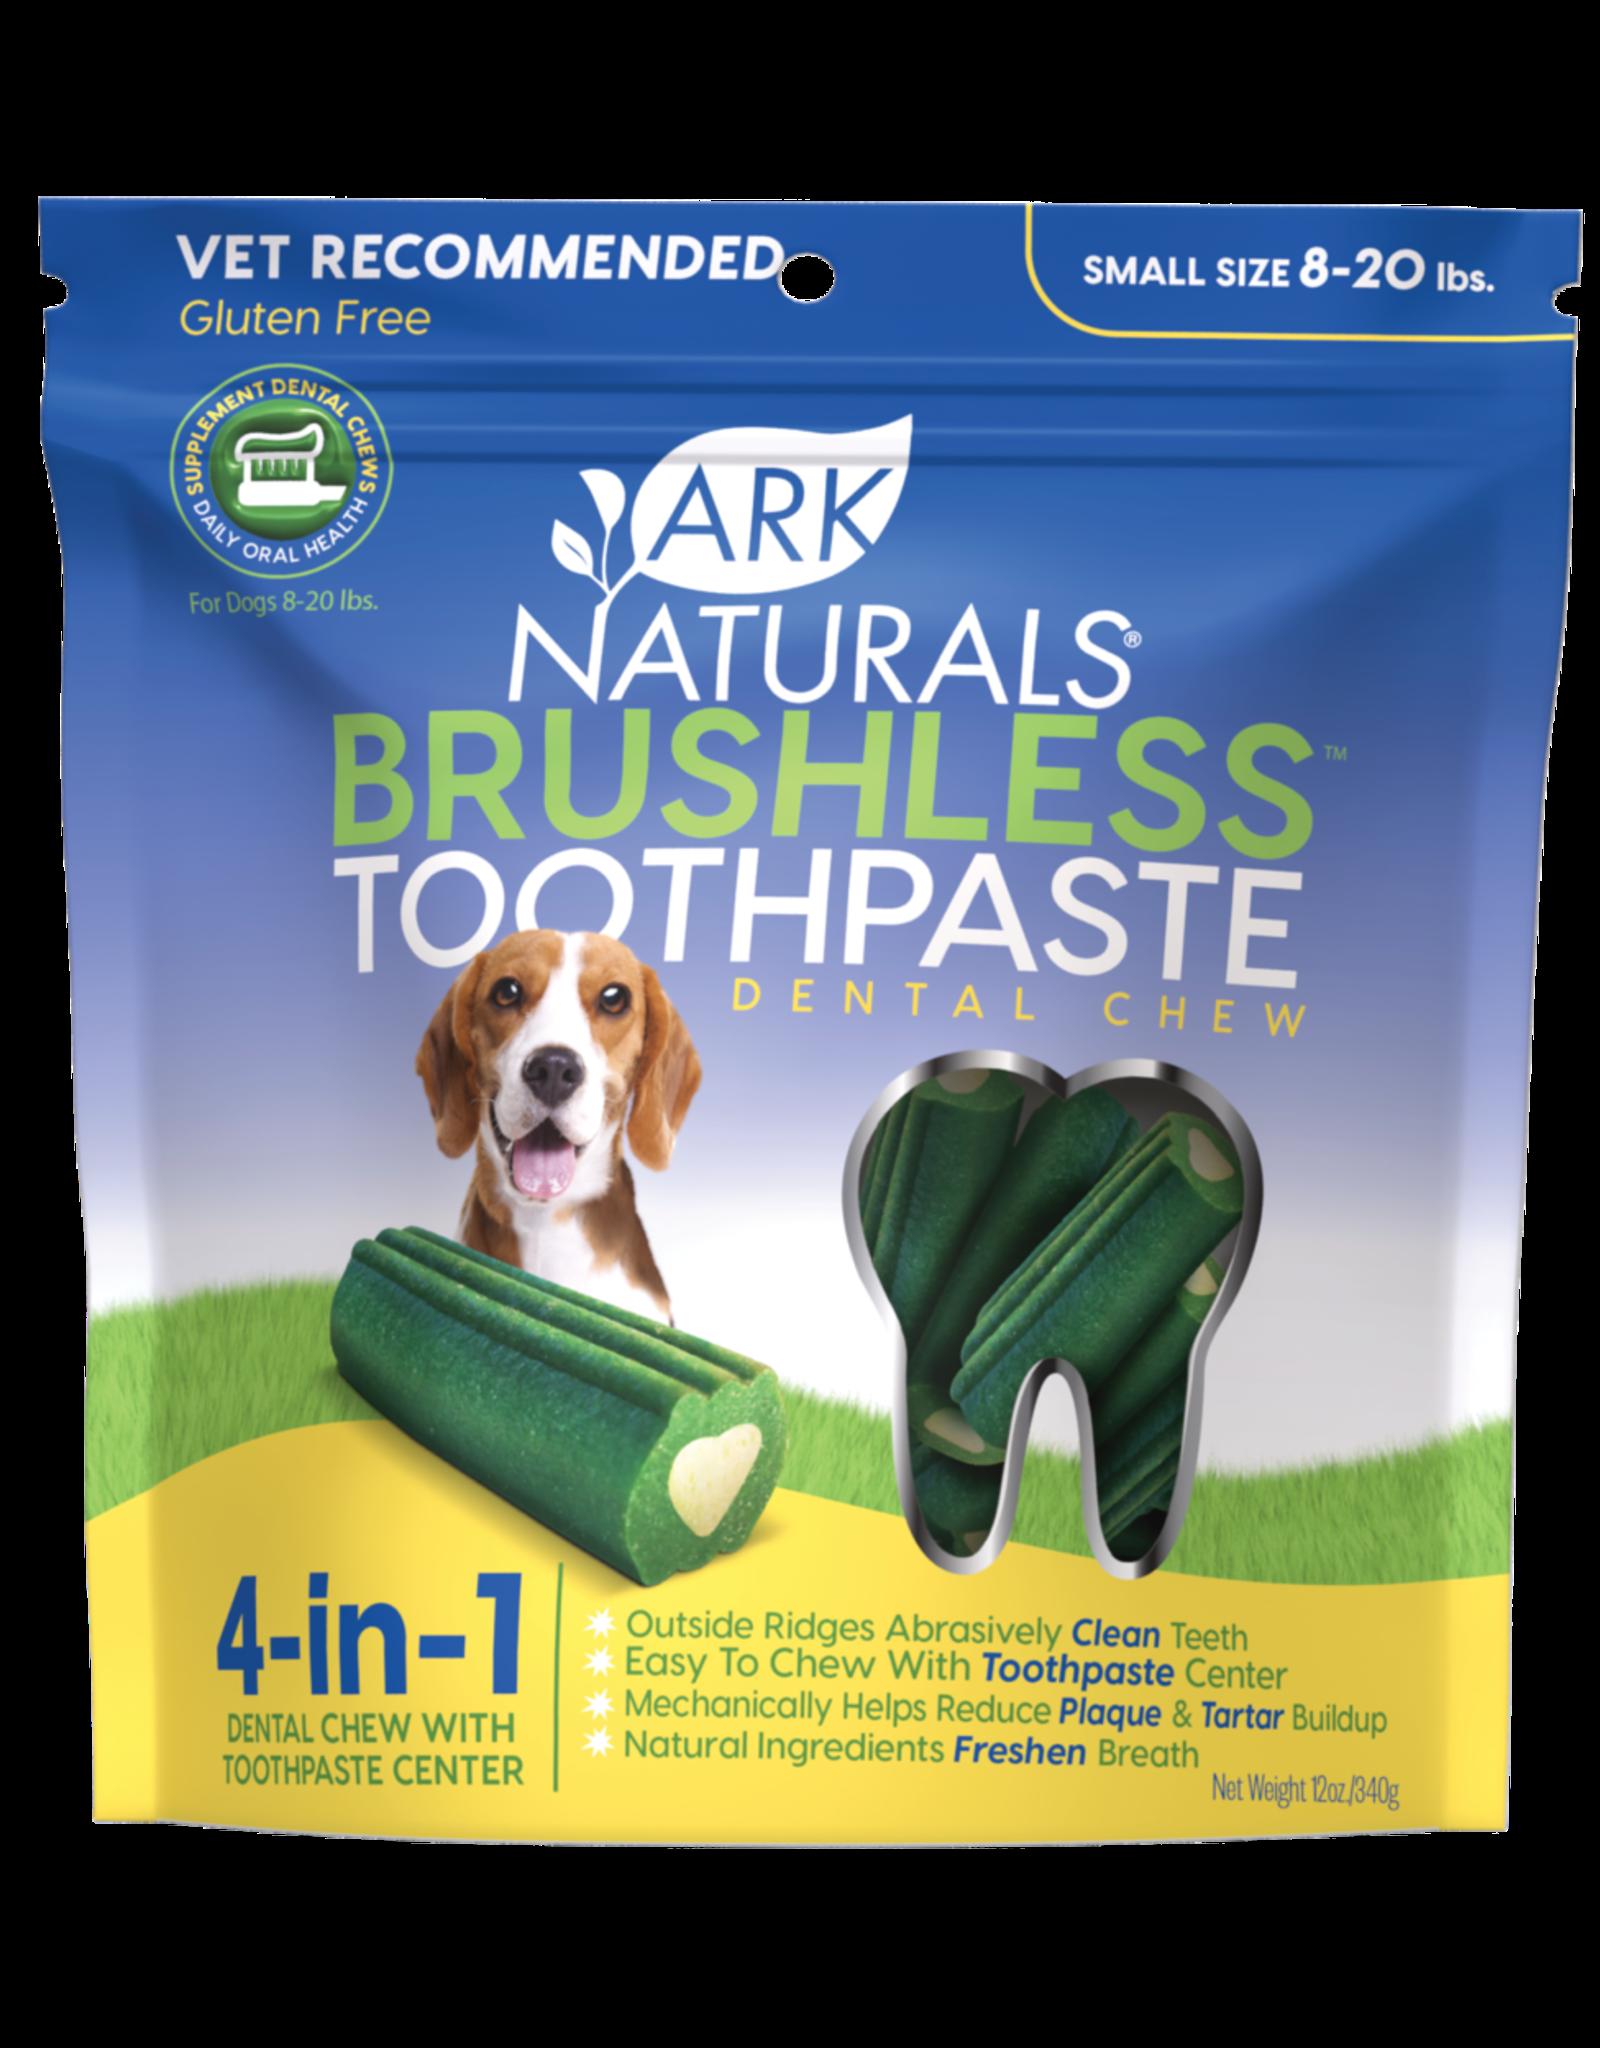 ARK: Breathless Toothpaste SM MD 12oz